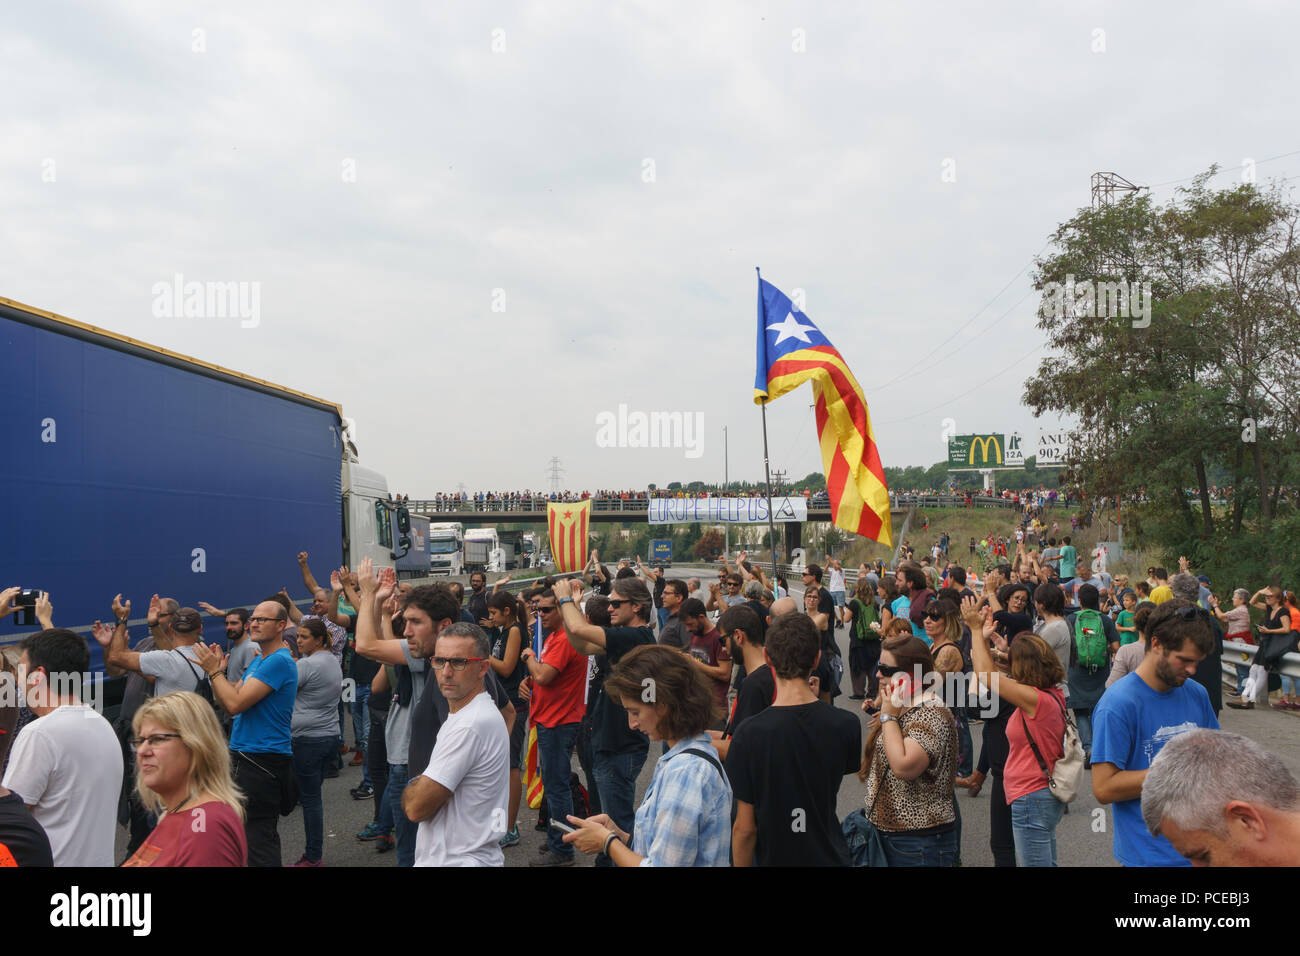 Cardedeu, Catalonia, Spain, October 3, 2017: paceful people